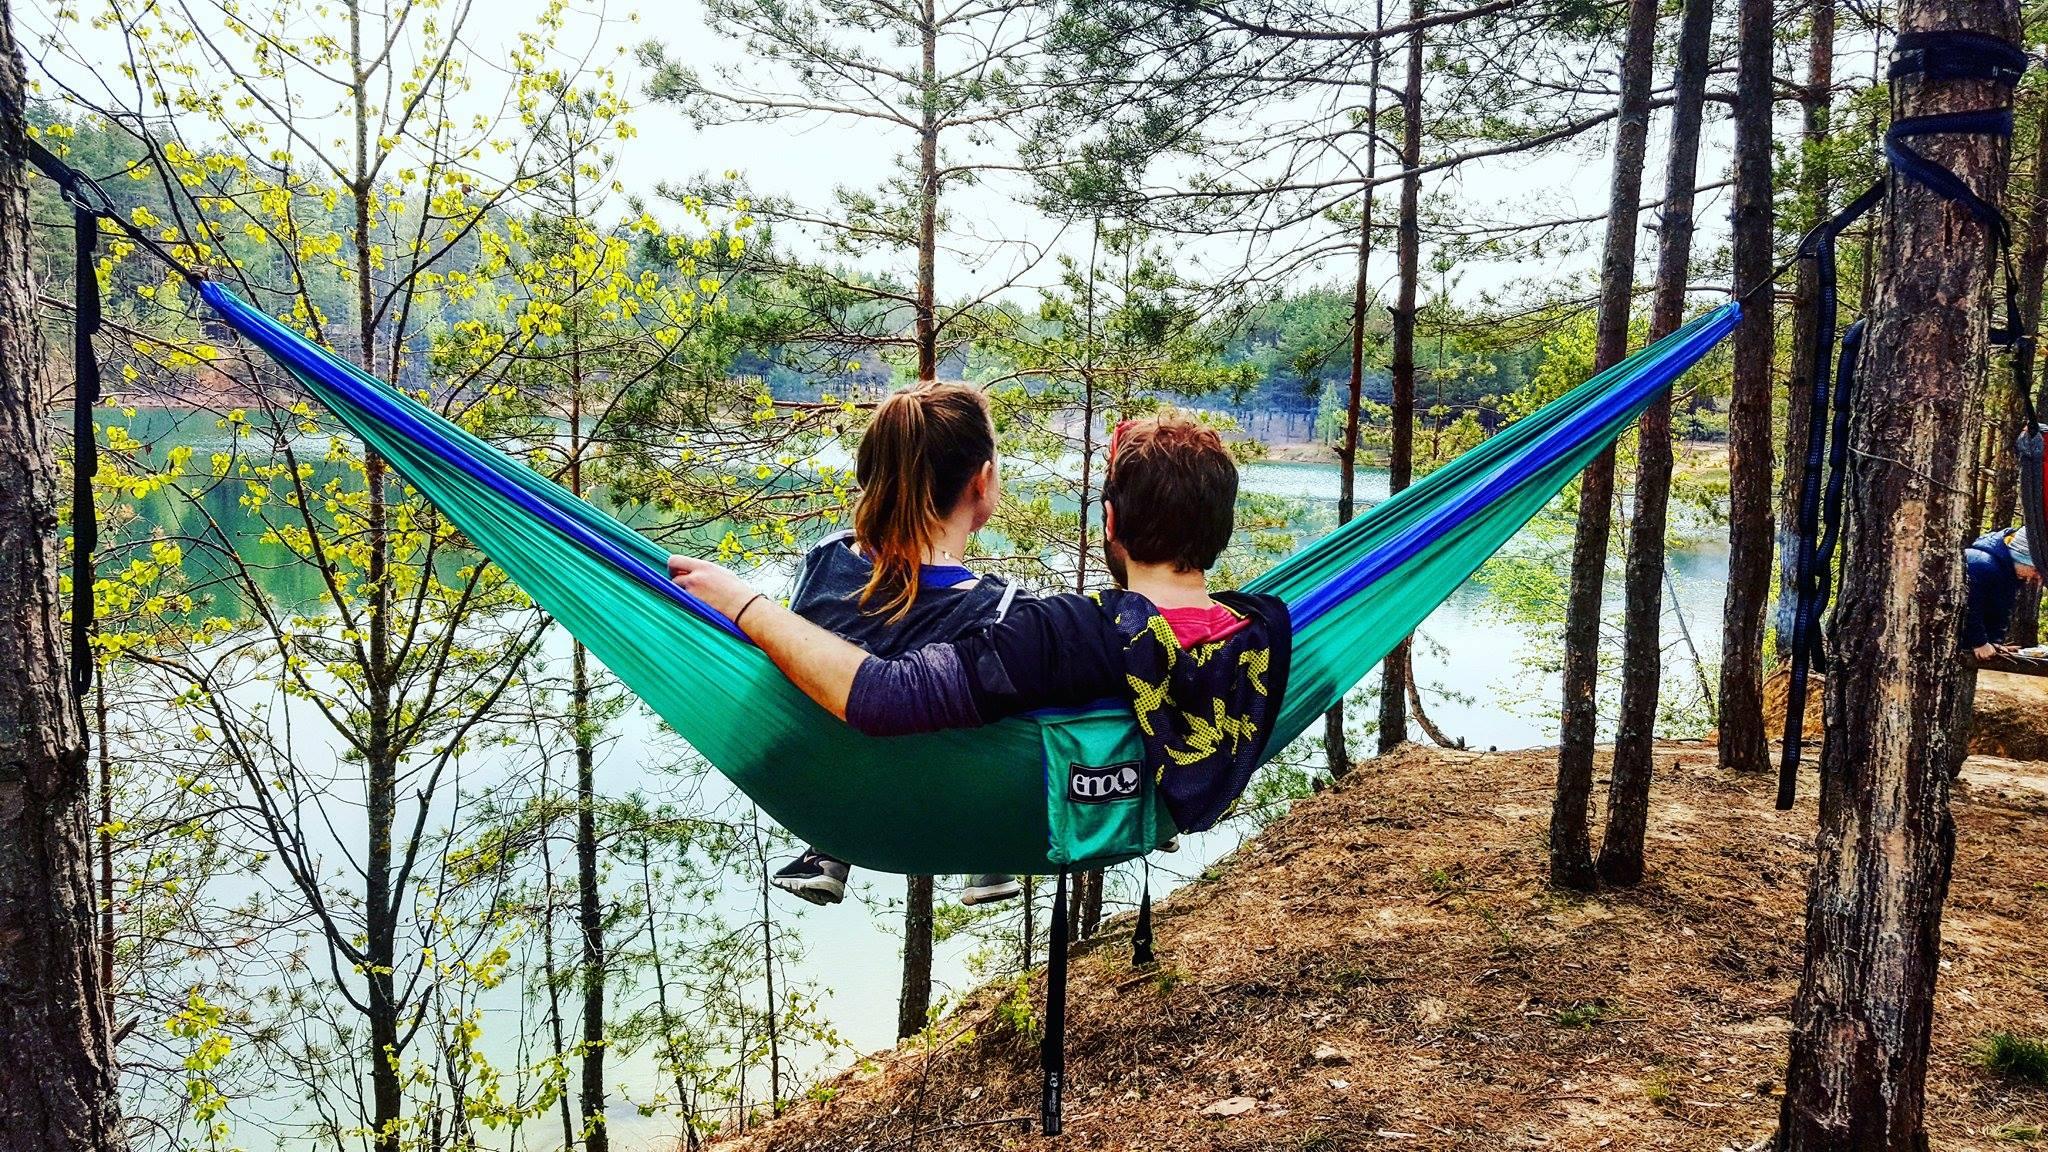 eno hammock by the lake the best hammock  eno or grand trunk  u2013 life travelers traveling life  rh   lifetravelerstravelinglife